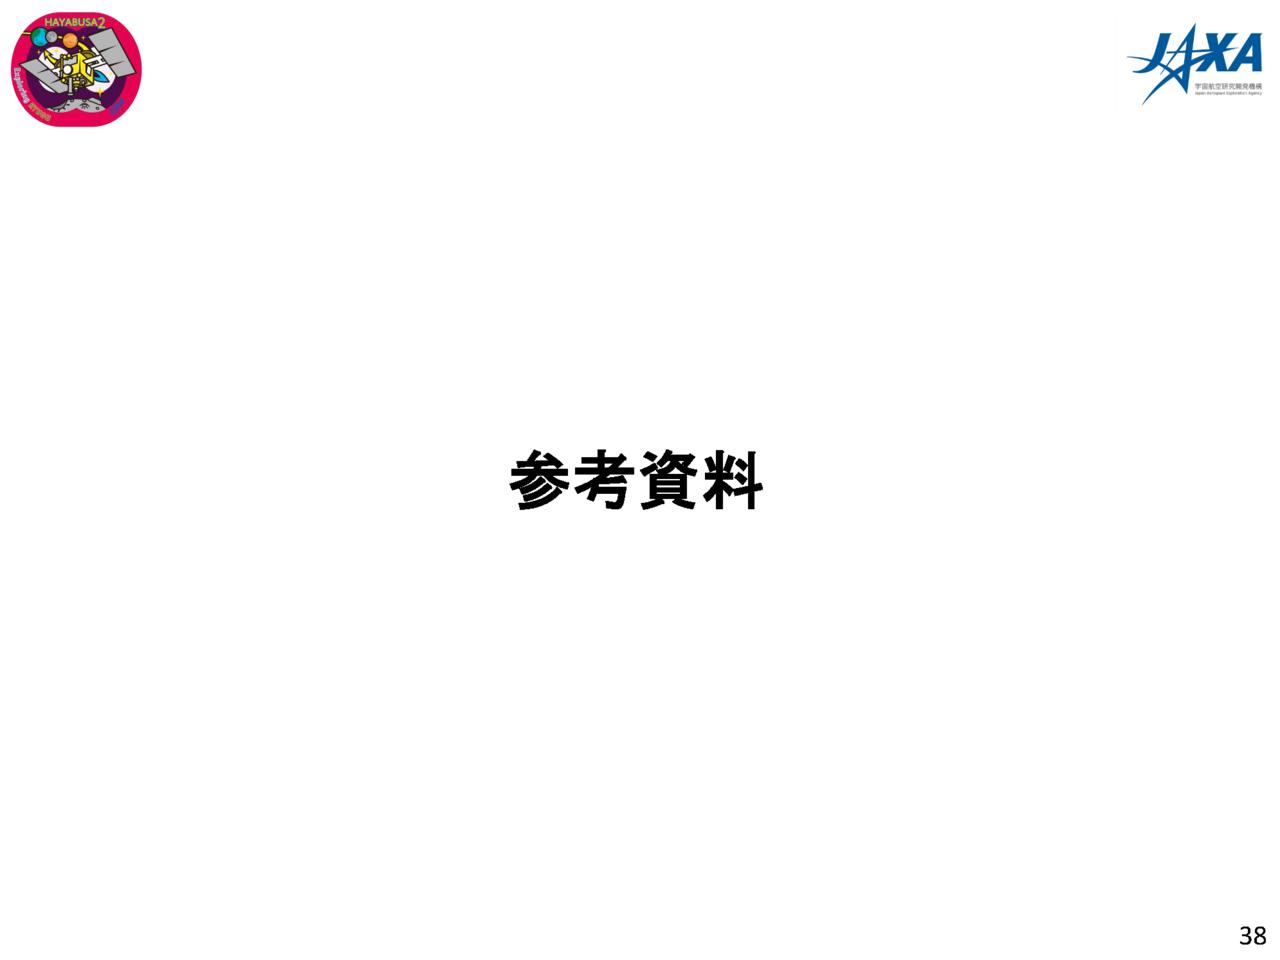 f:id:Imamura:20180719131733p:plain